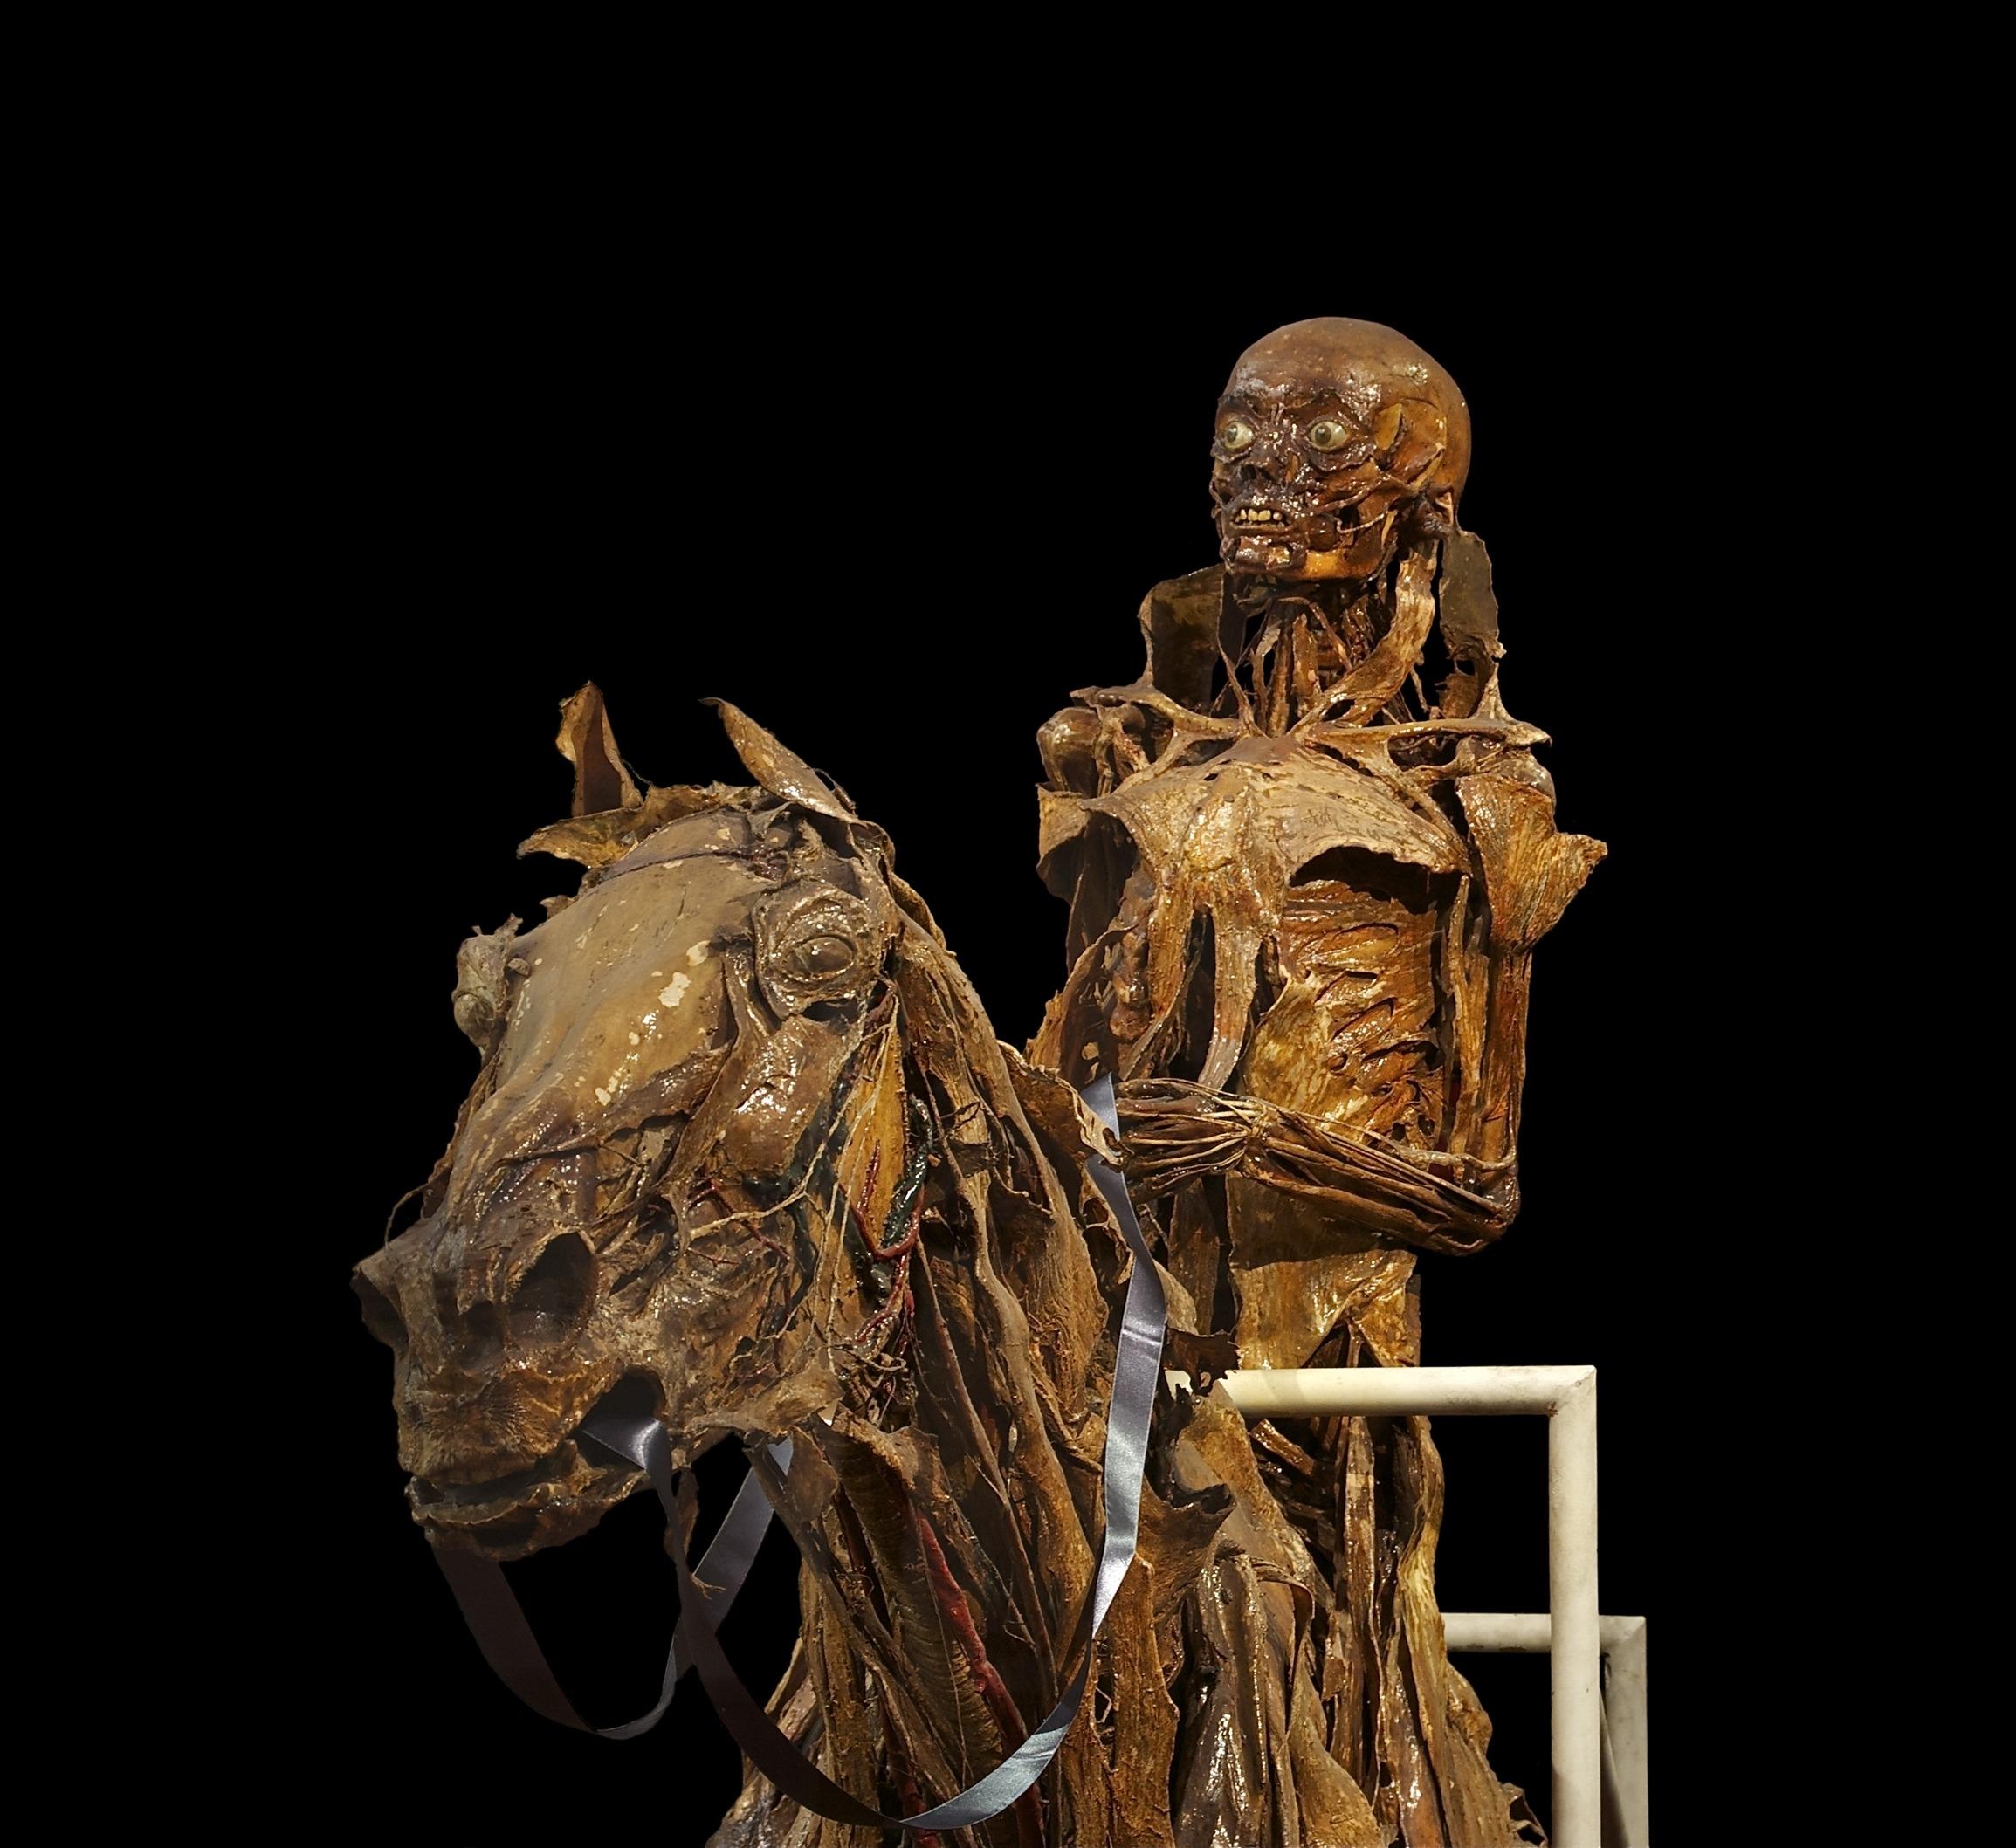 Fotos gratis : madera, Monumento, estatua, caballo, humano, muerto ...